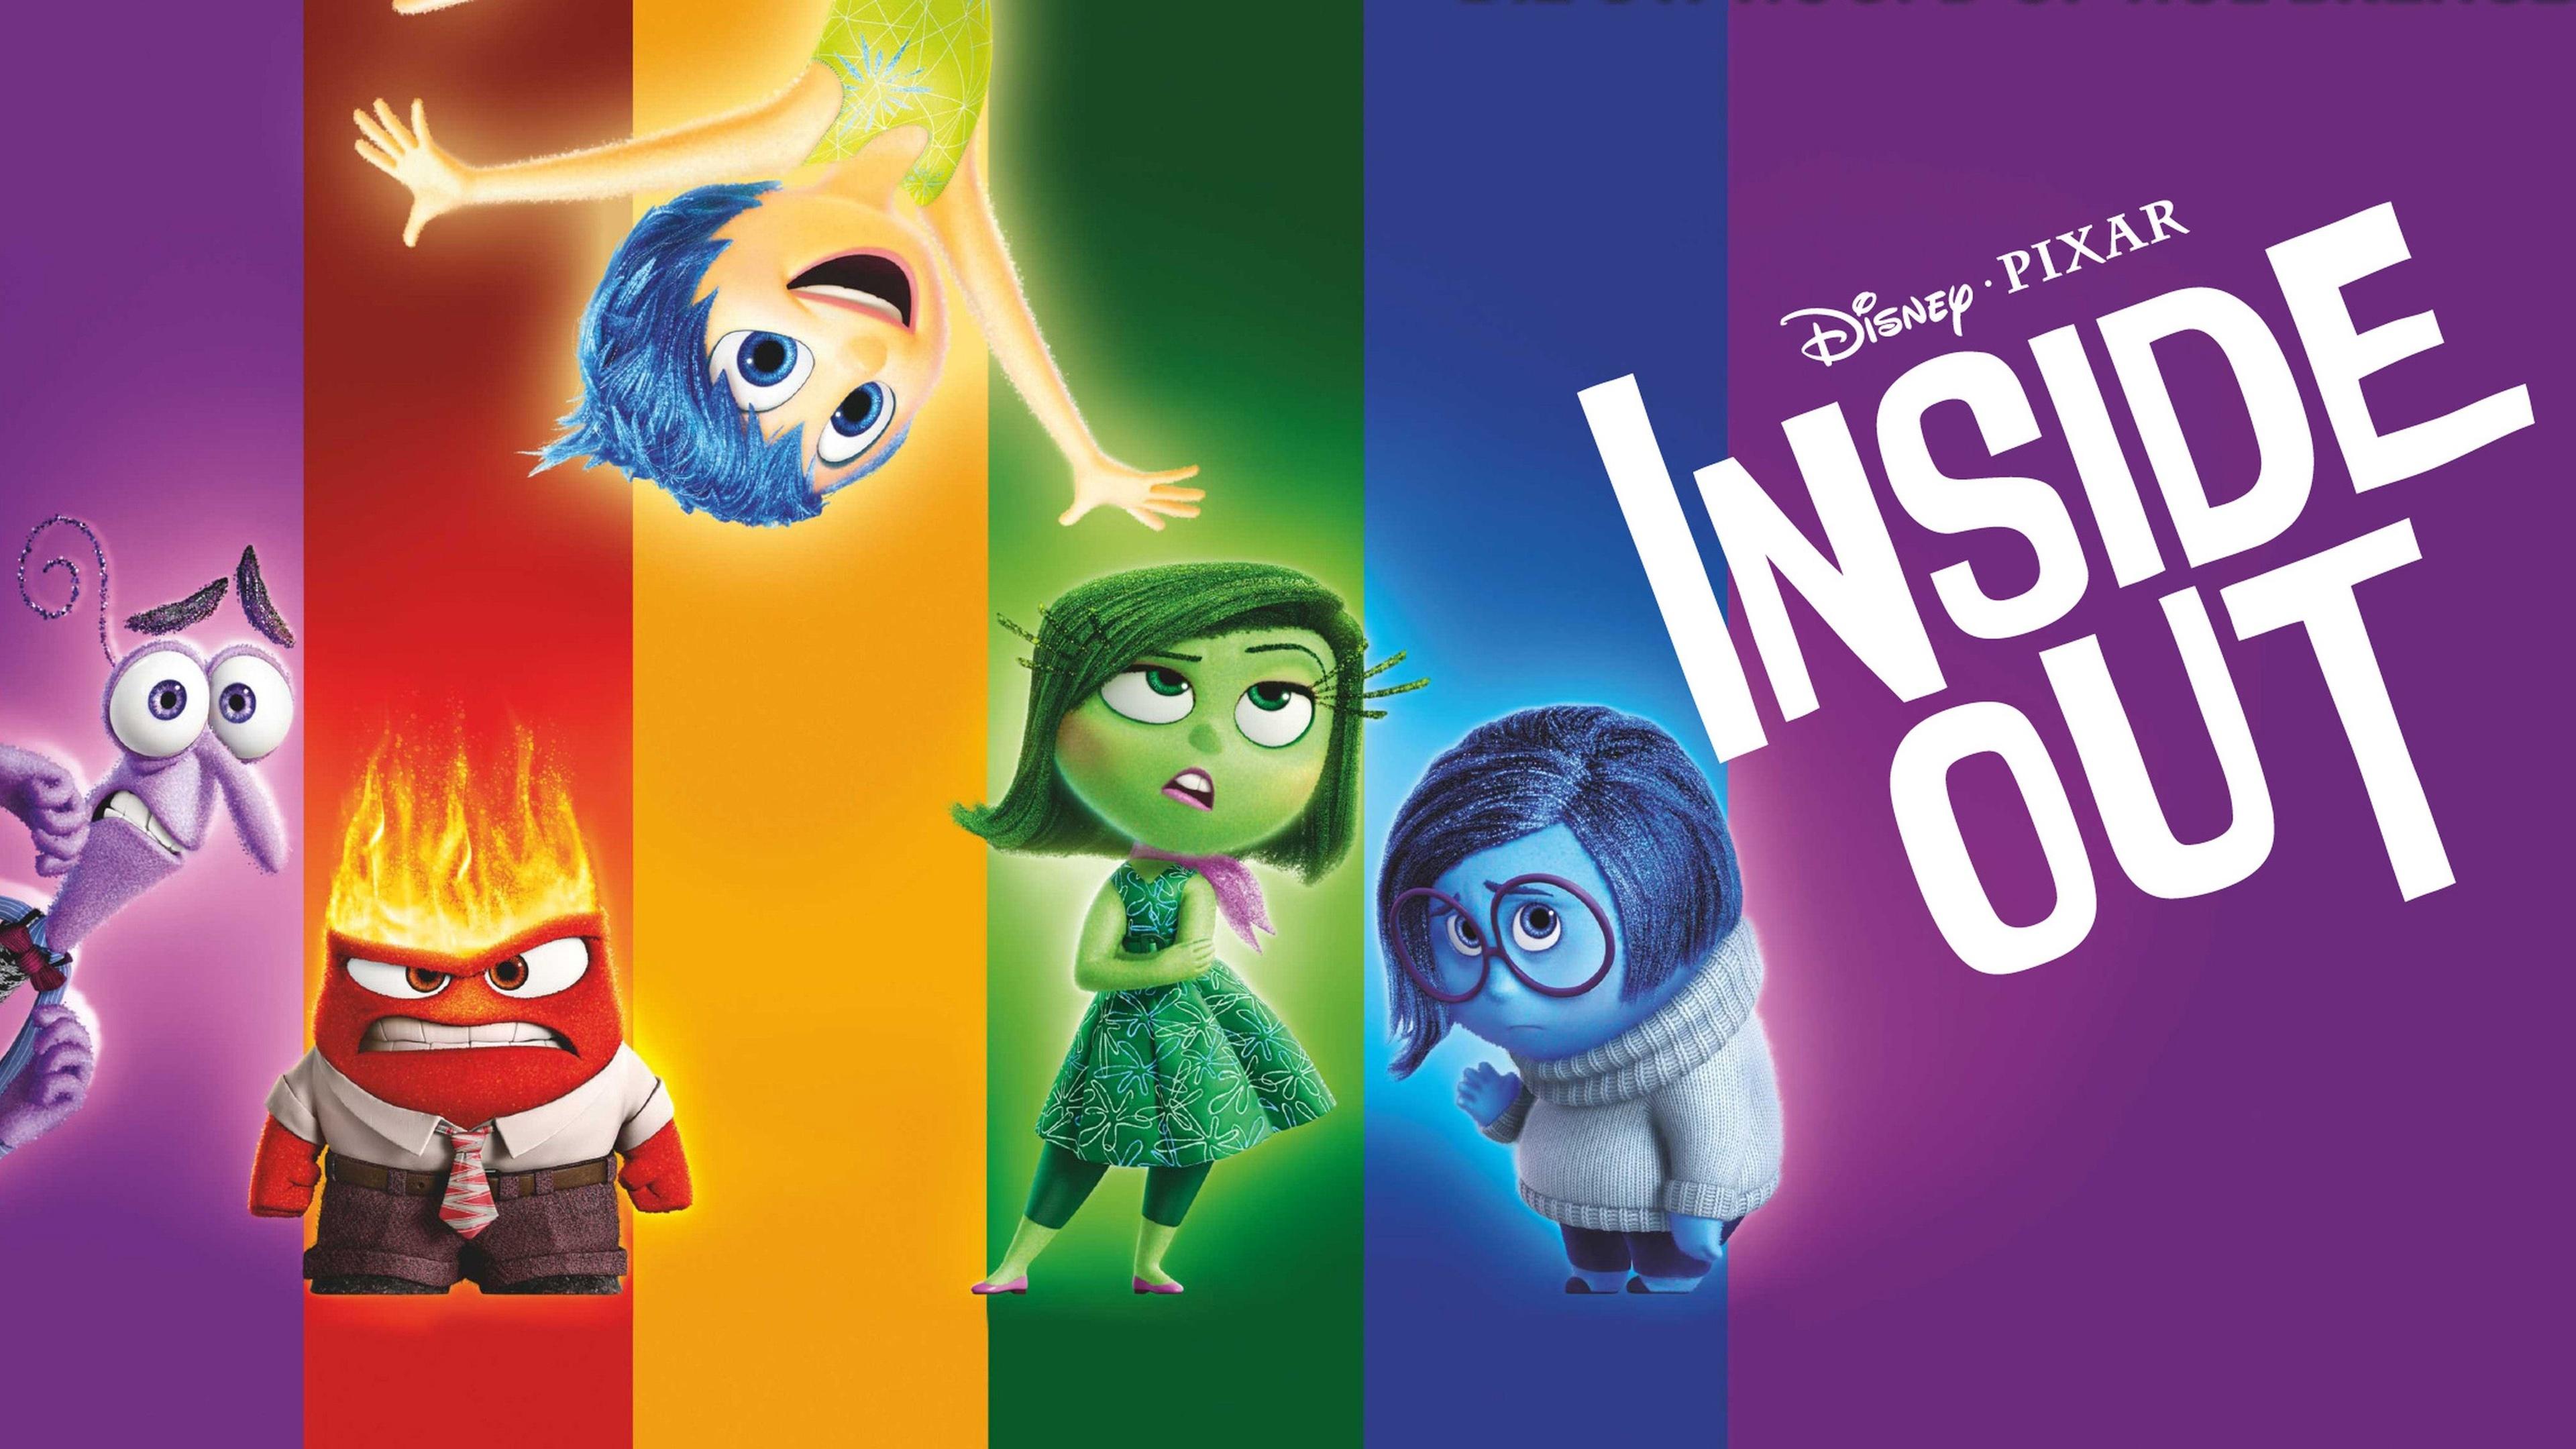 Disney Pixar Movie Wallpaper 4K Wallpaper   Ultra HD 4K Wallpapers 3840x2160